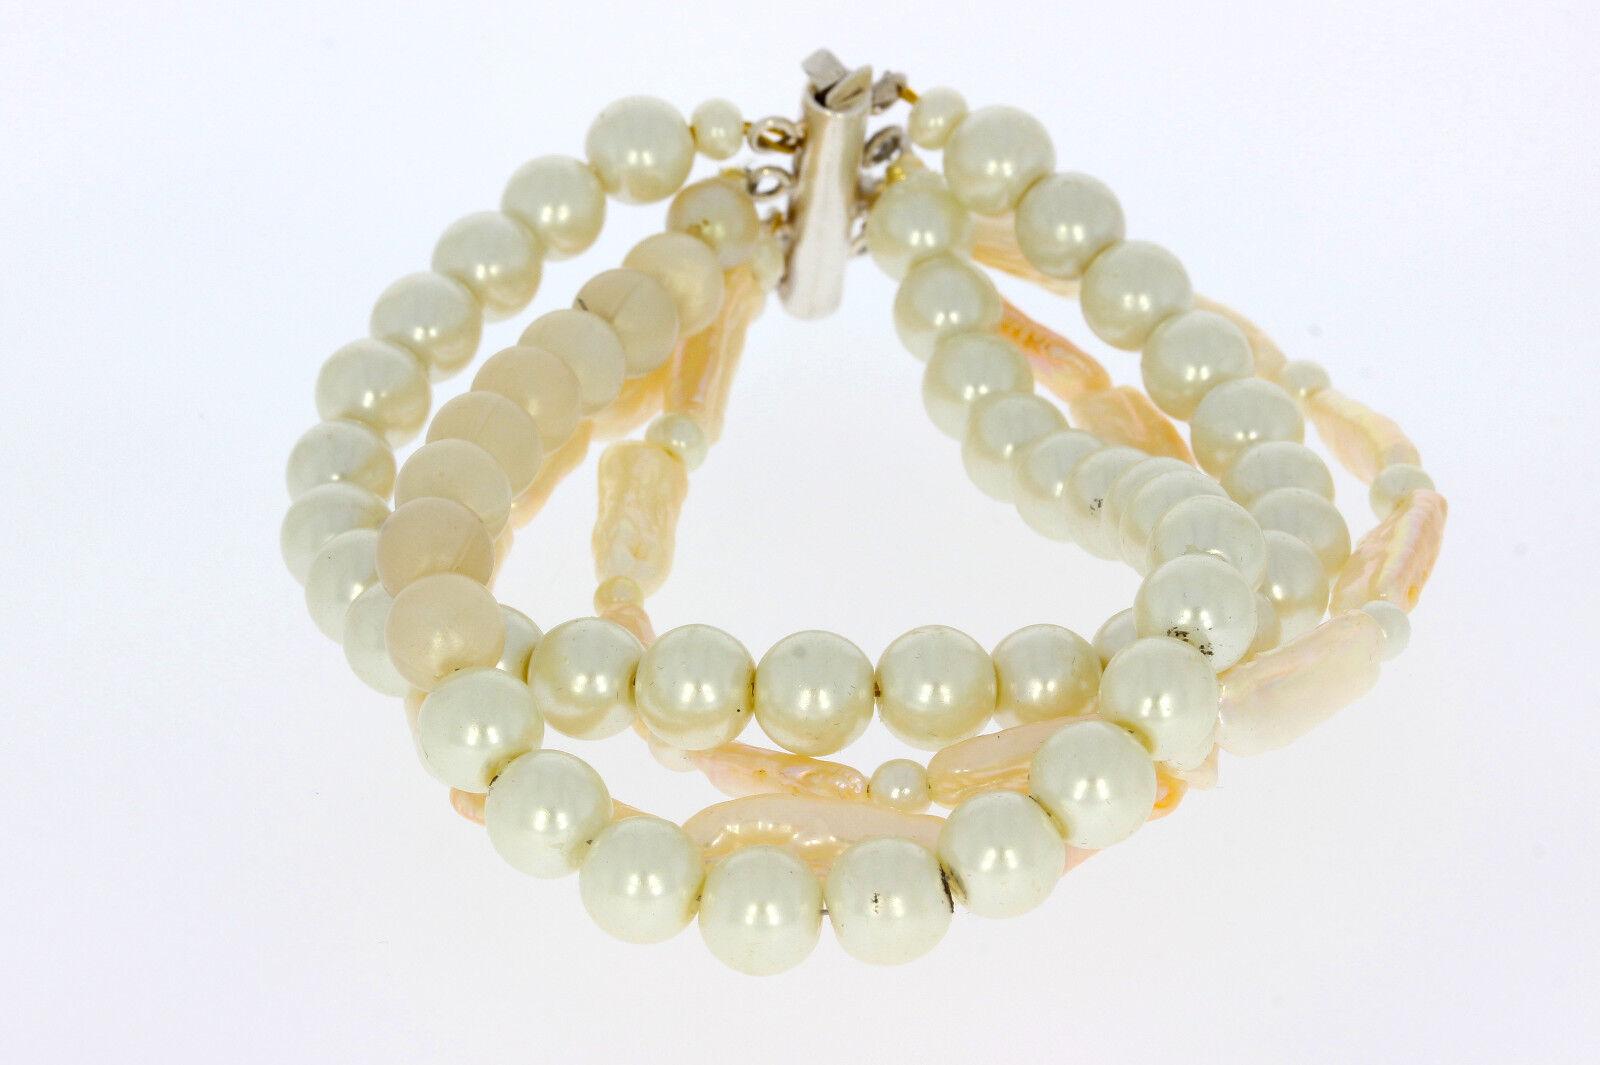 A0286-4 Reihige Perlenarmkette lang 22 cm Breit 2,5 cm Gewicht 49 Gramm